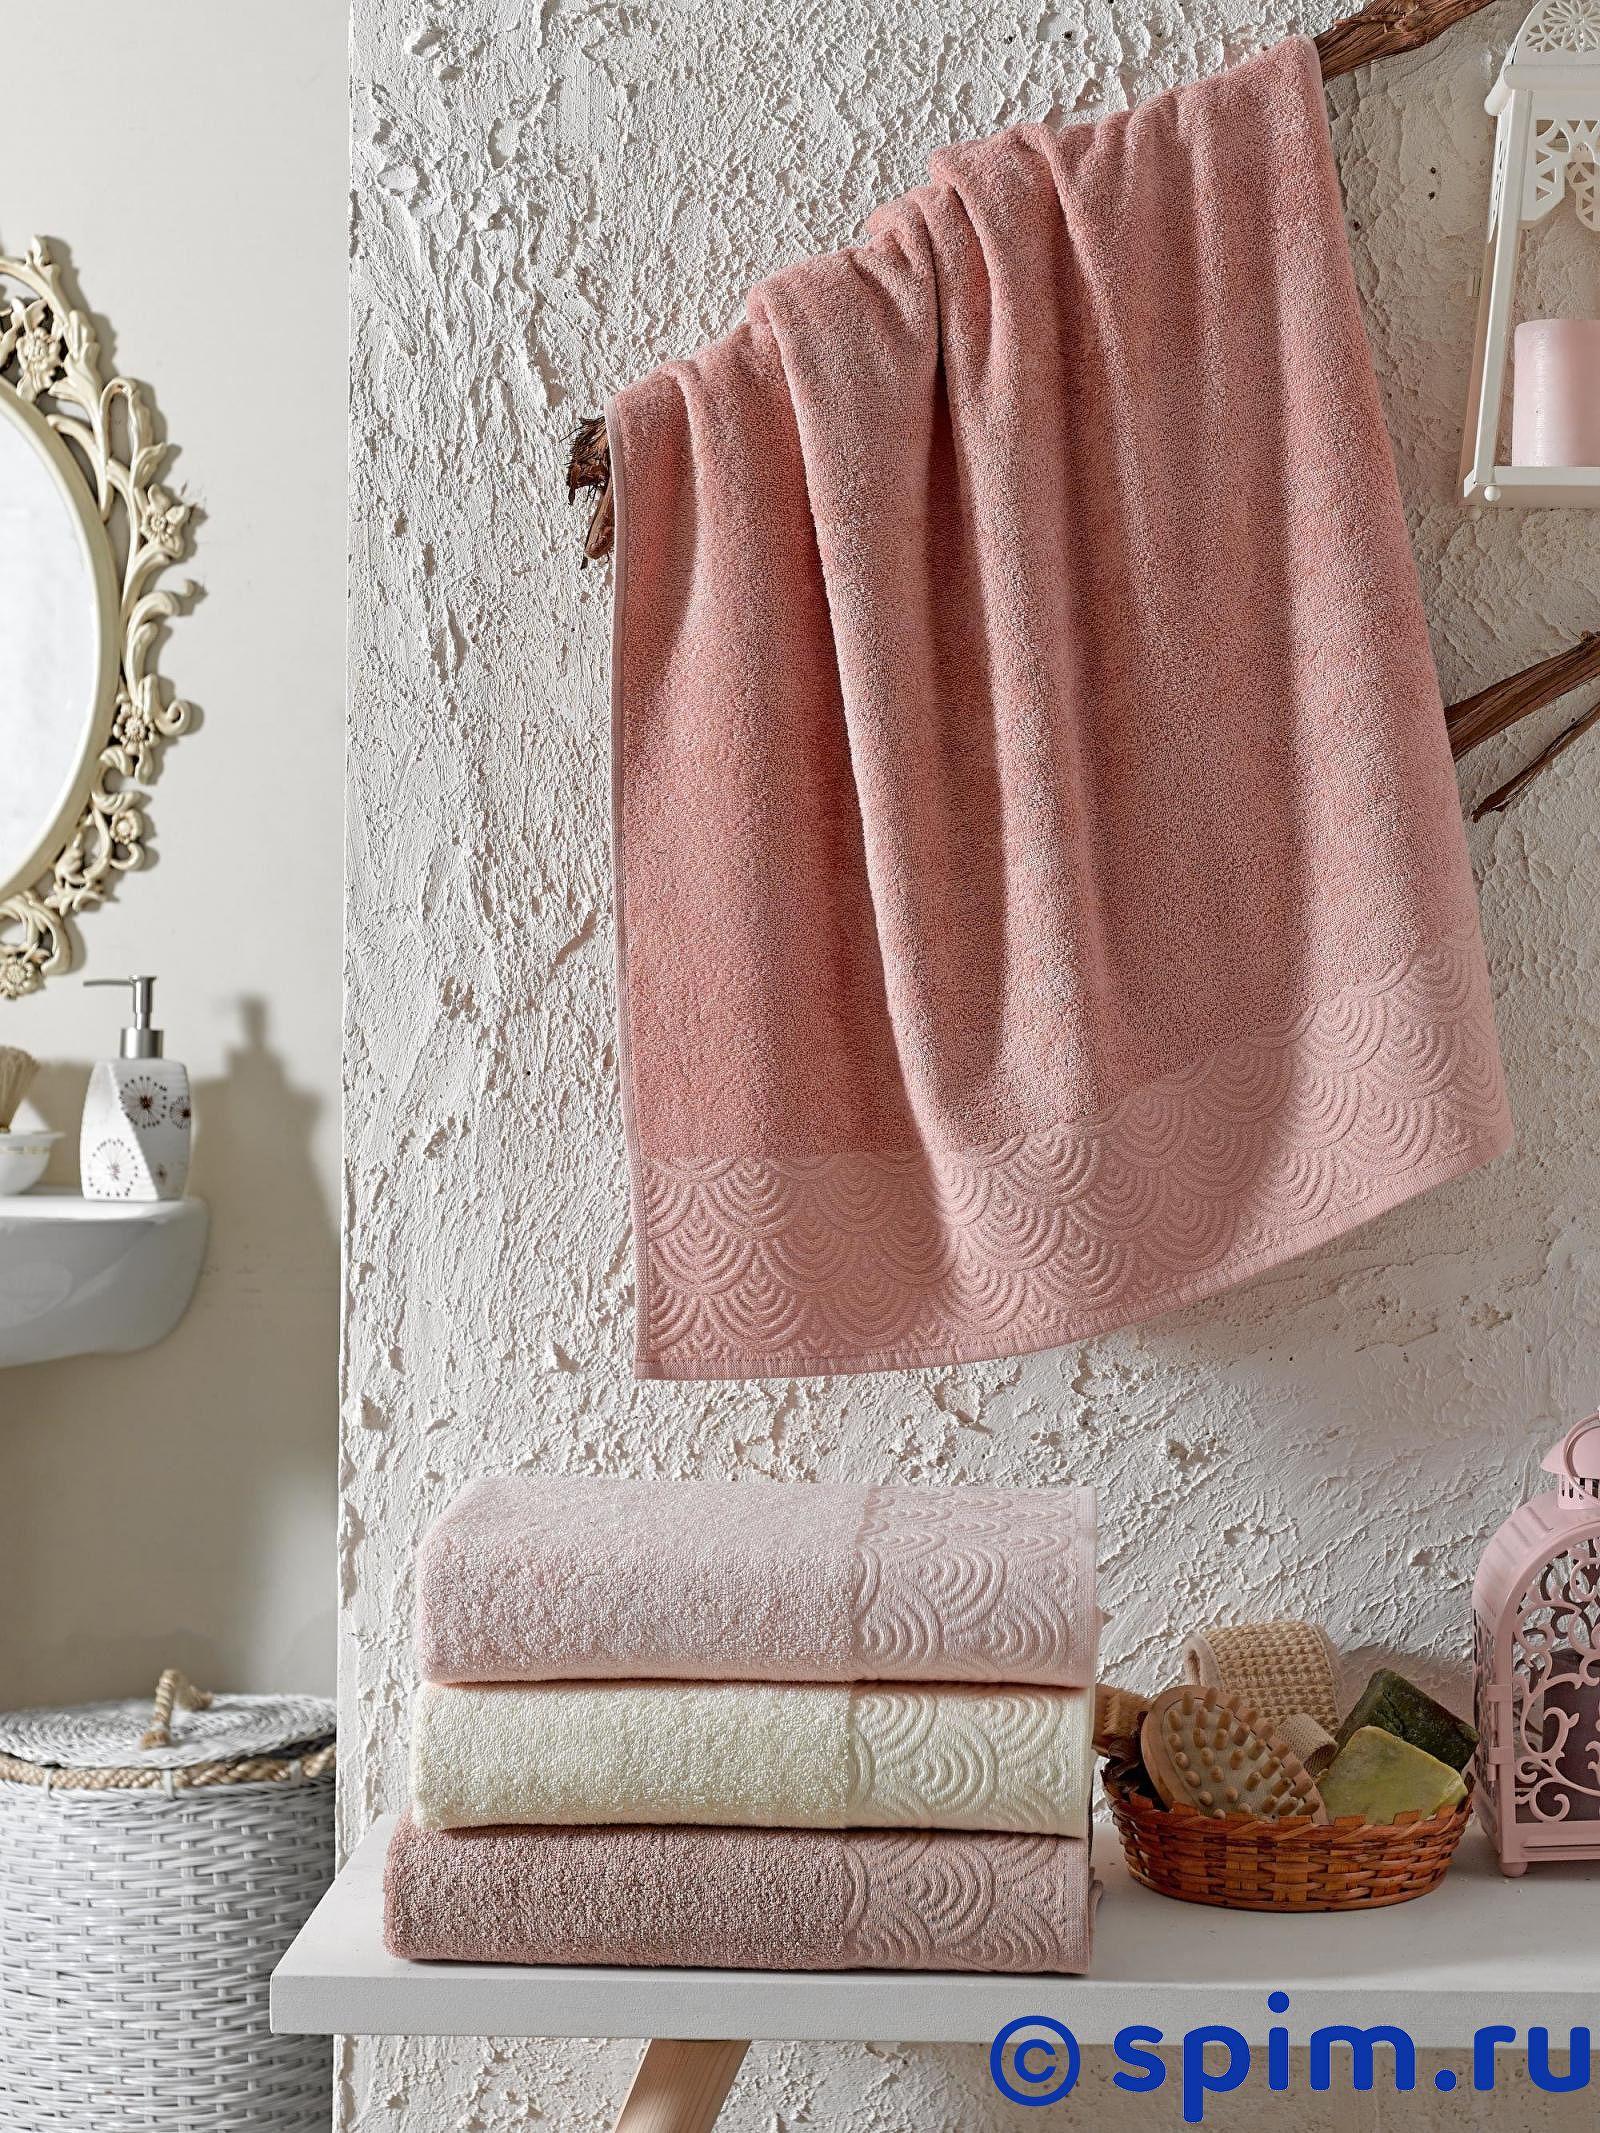 Набор из 4-х полотенец Do&co Rainbow 50х90 см полотенца do n co полотенце lady цвет мятный набор